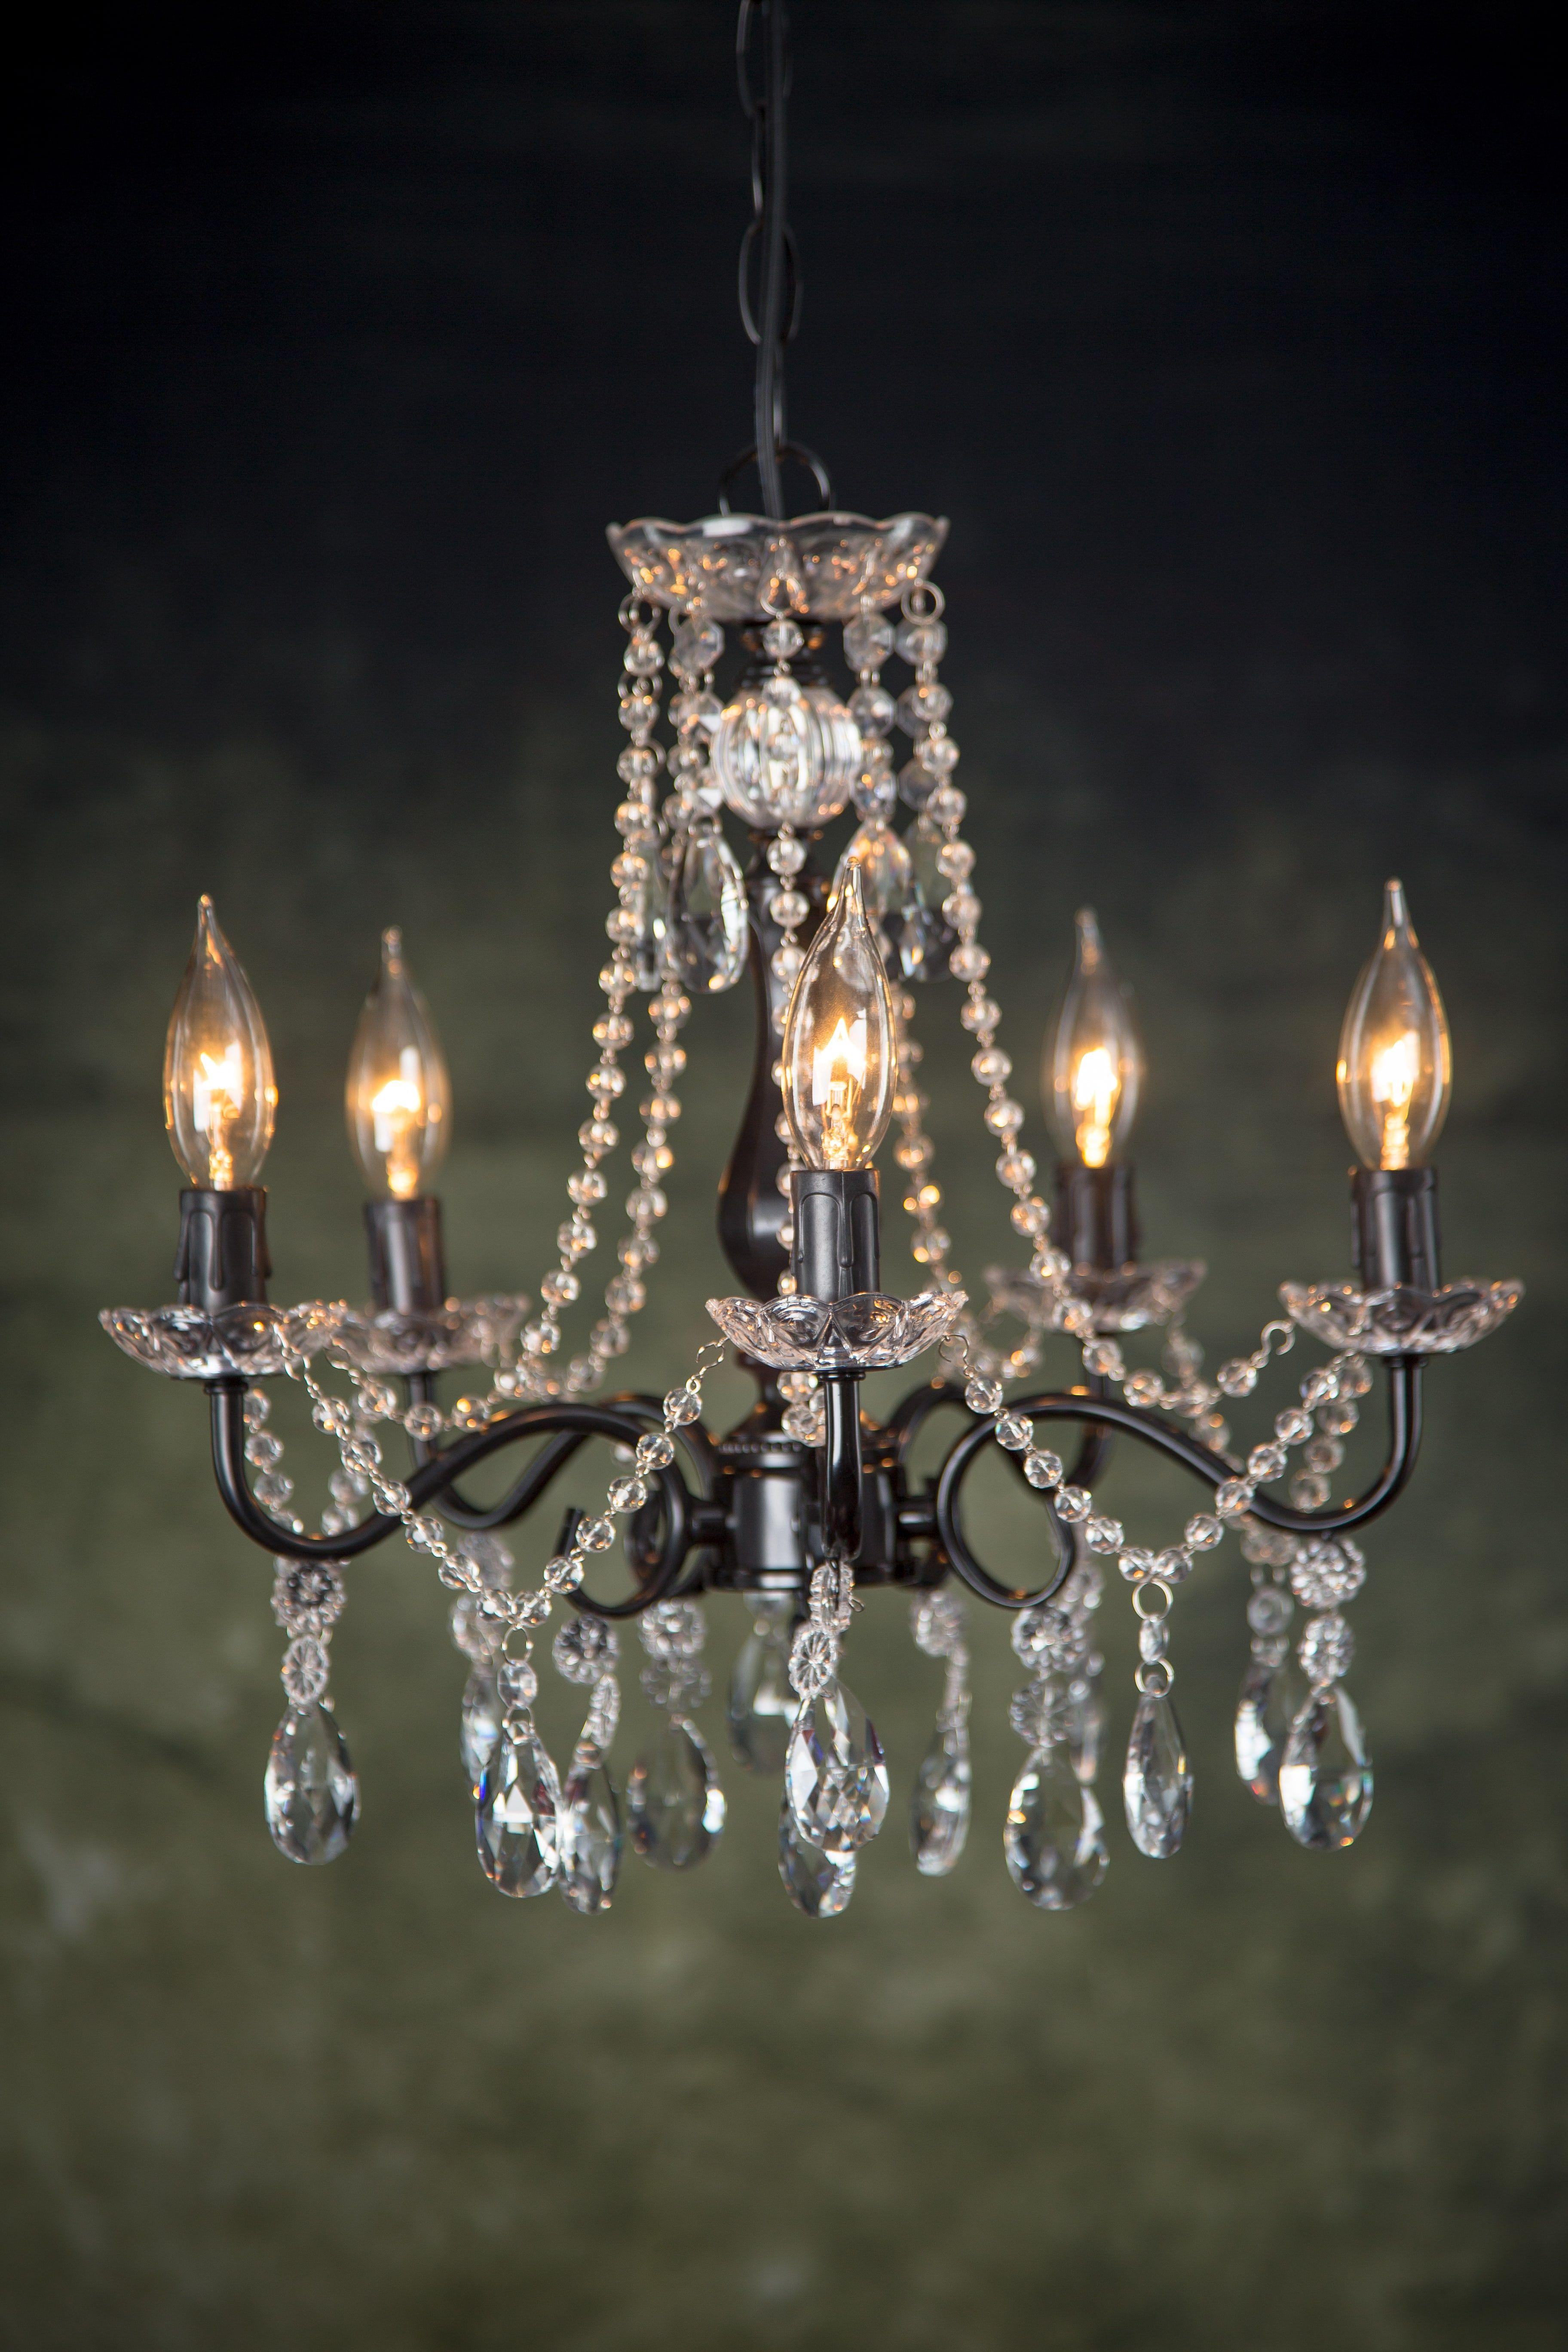 5 Light Swoop Arm Crystal Plug In Chandelier Black